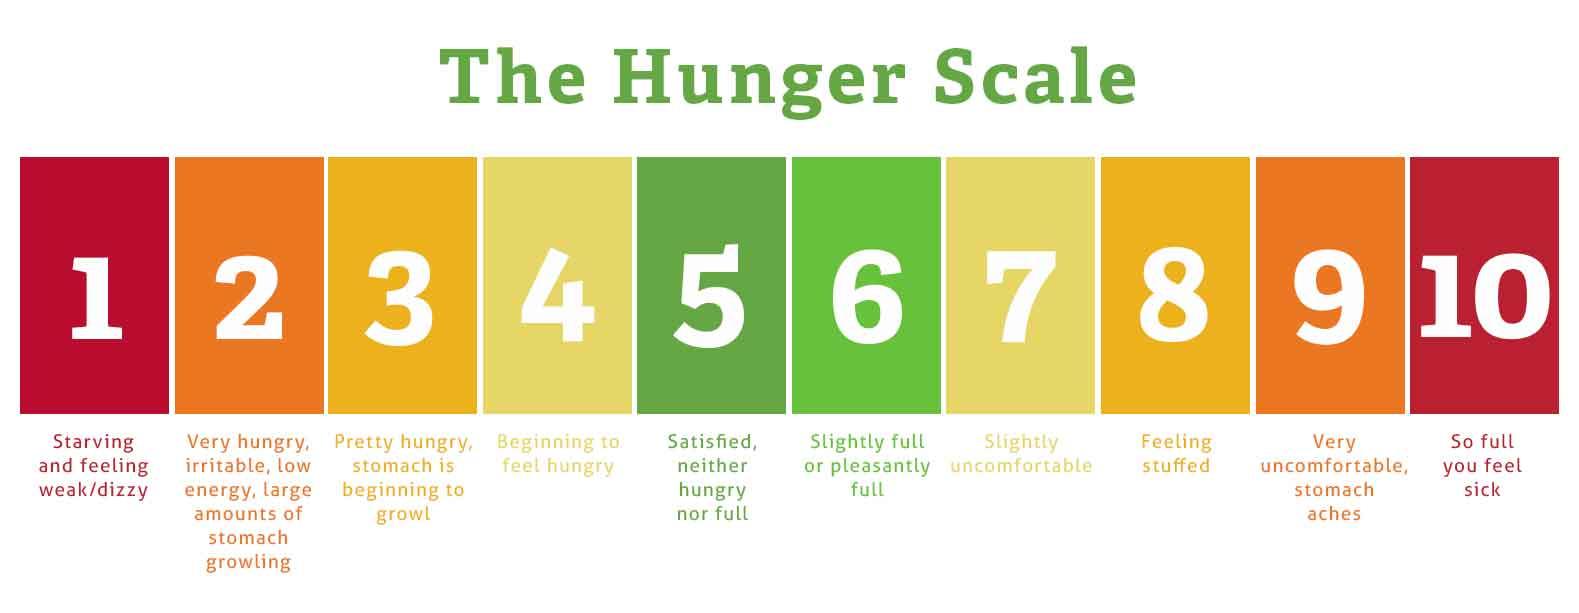 141-Hunger-Scale-dec-enews-small.jpg